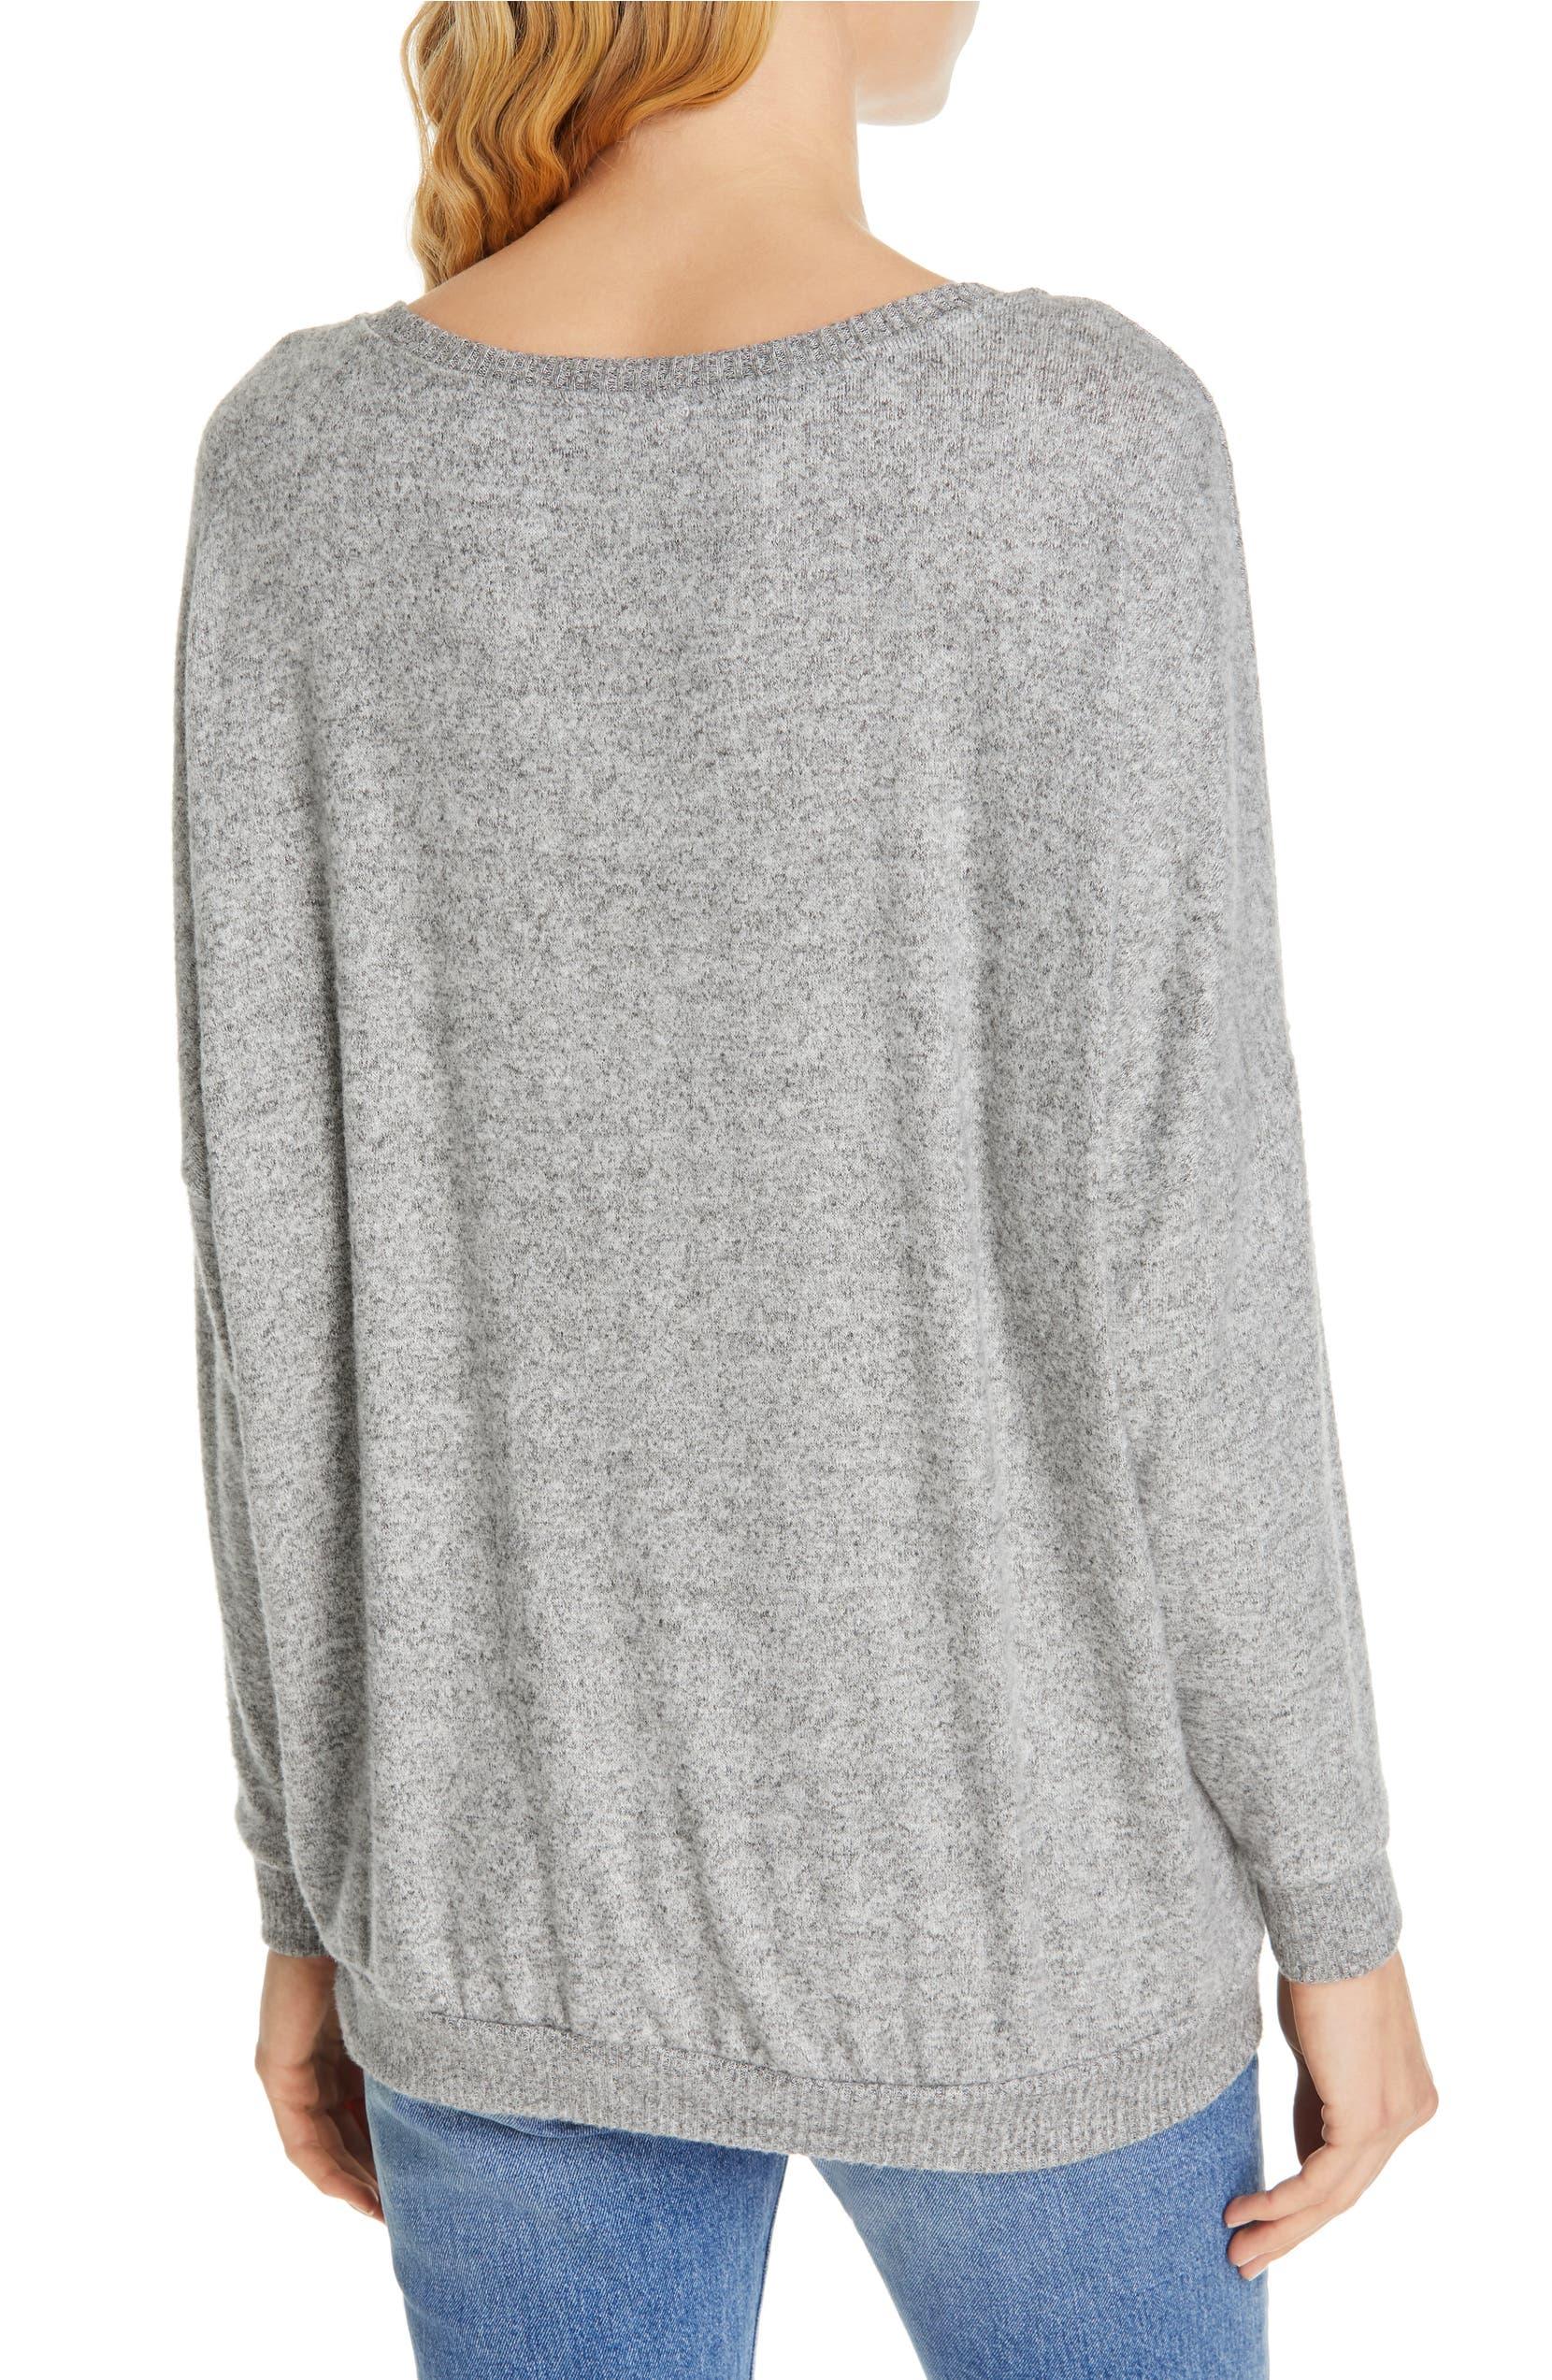 a36a41826cb98f Soft Joie Giardia Drop Shoulder Sweater